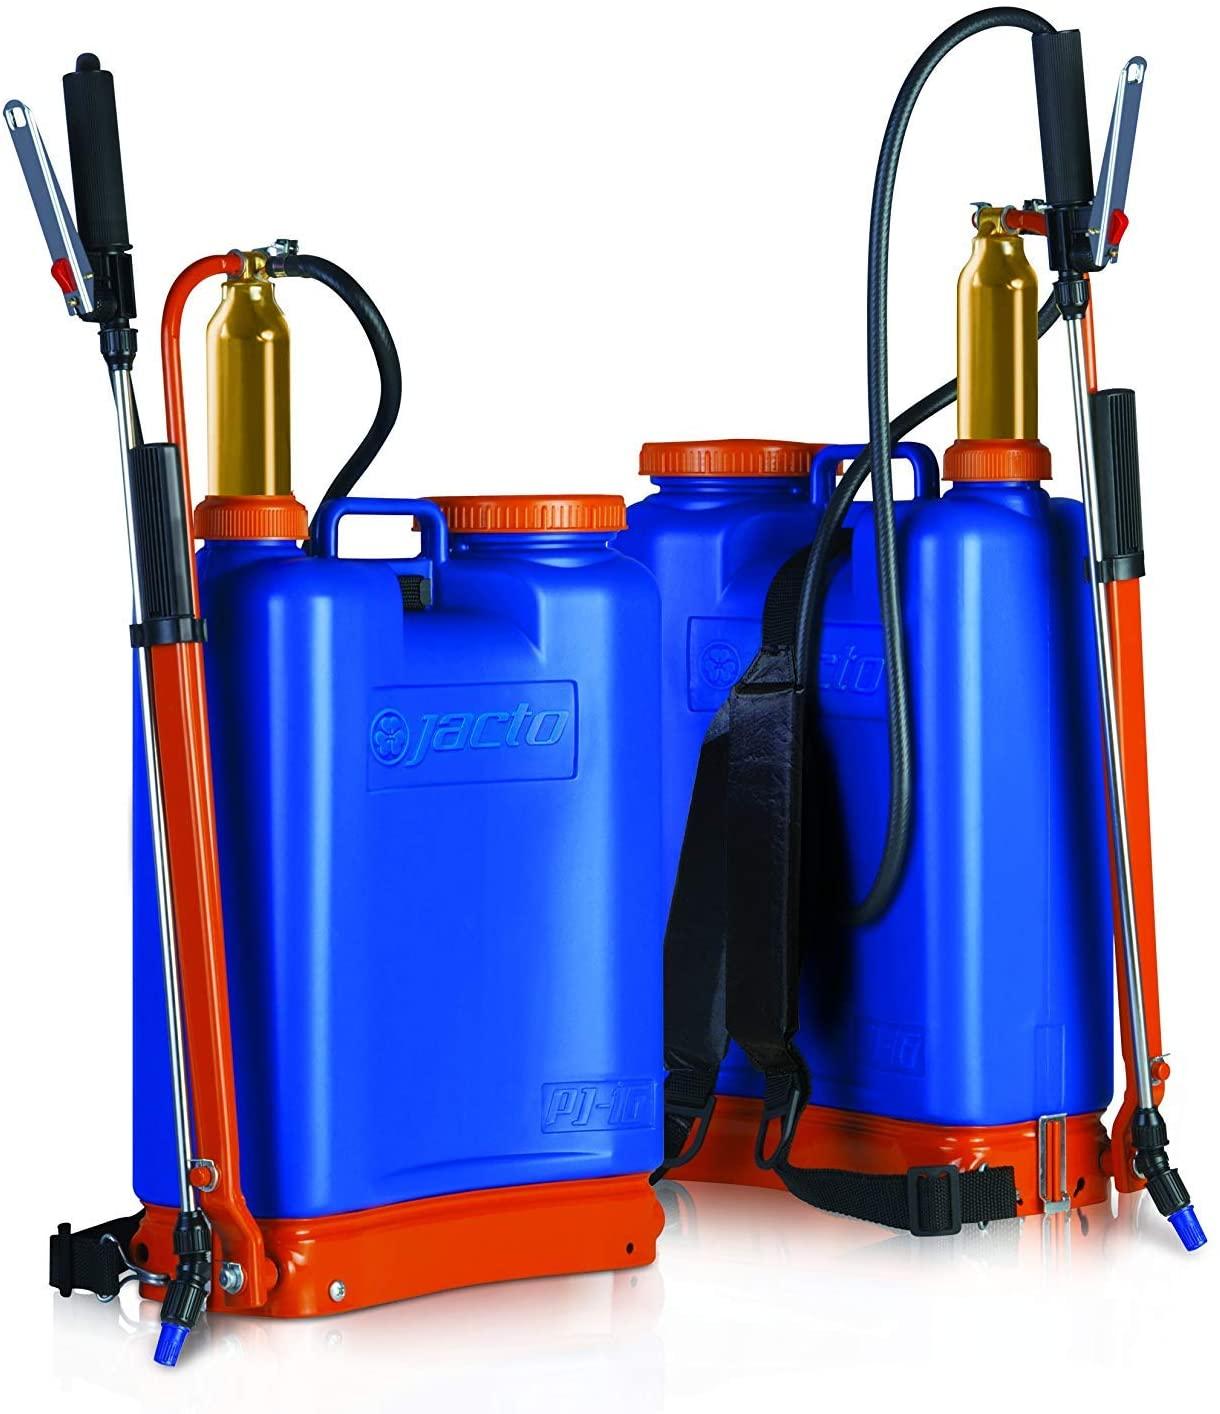 Jacto PJ16 Backpack Sprayer